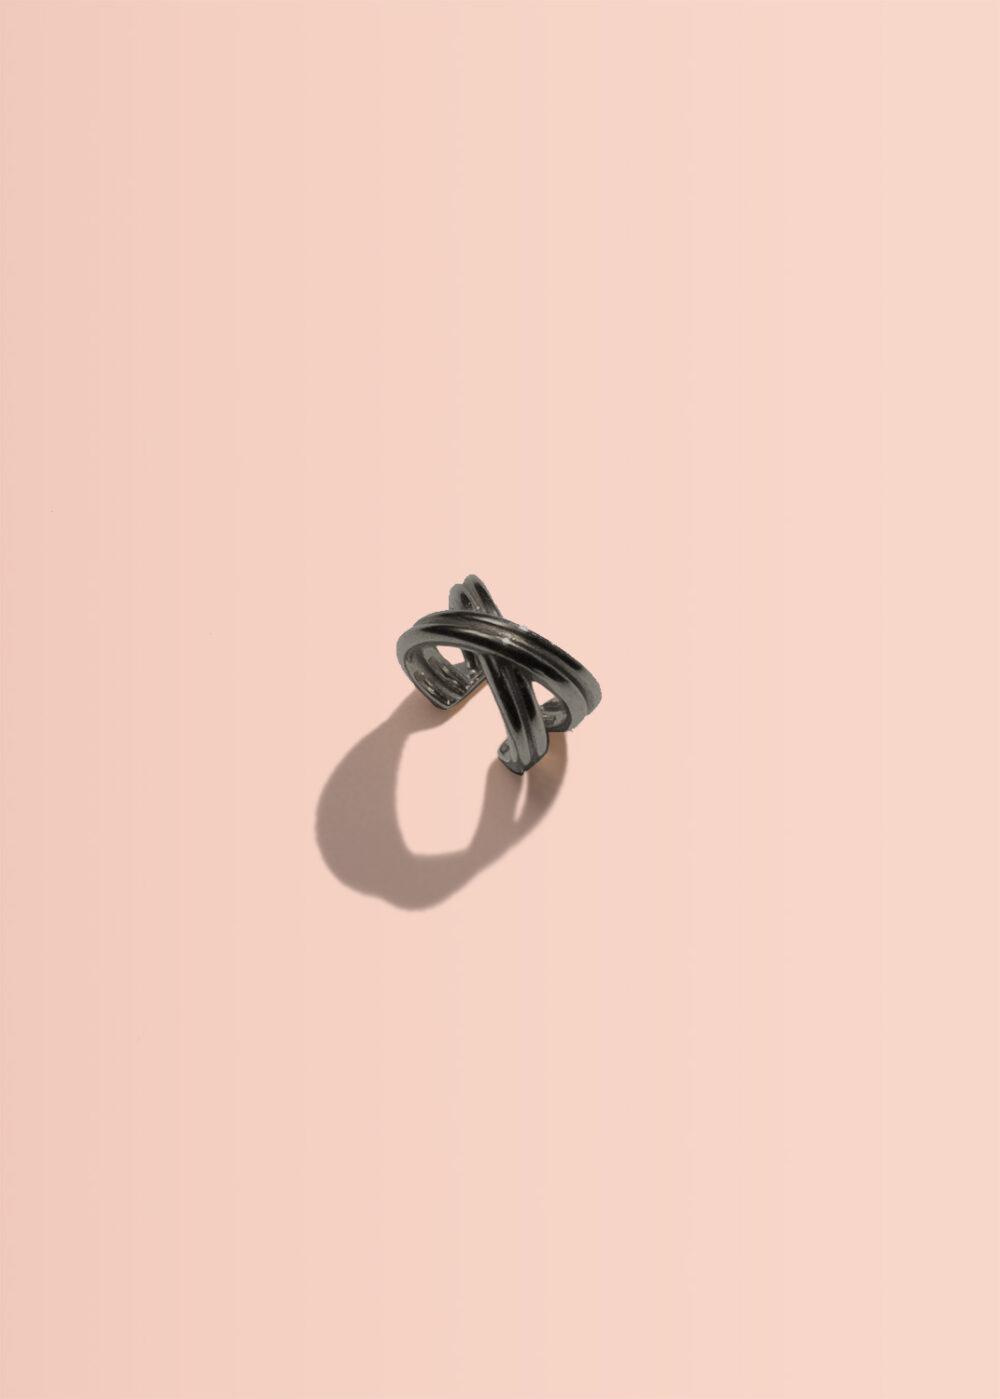 Ioanna-earcuff-schwarz-rhodiniert